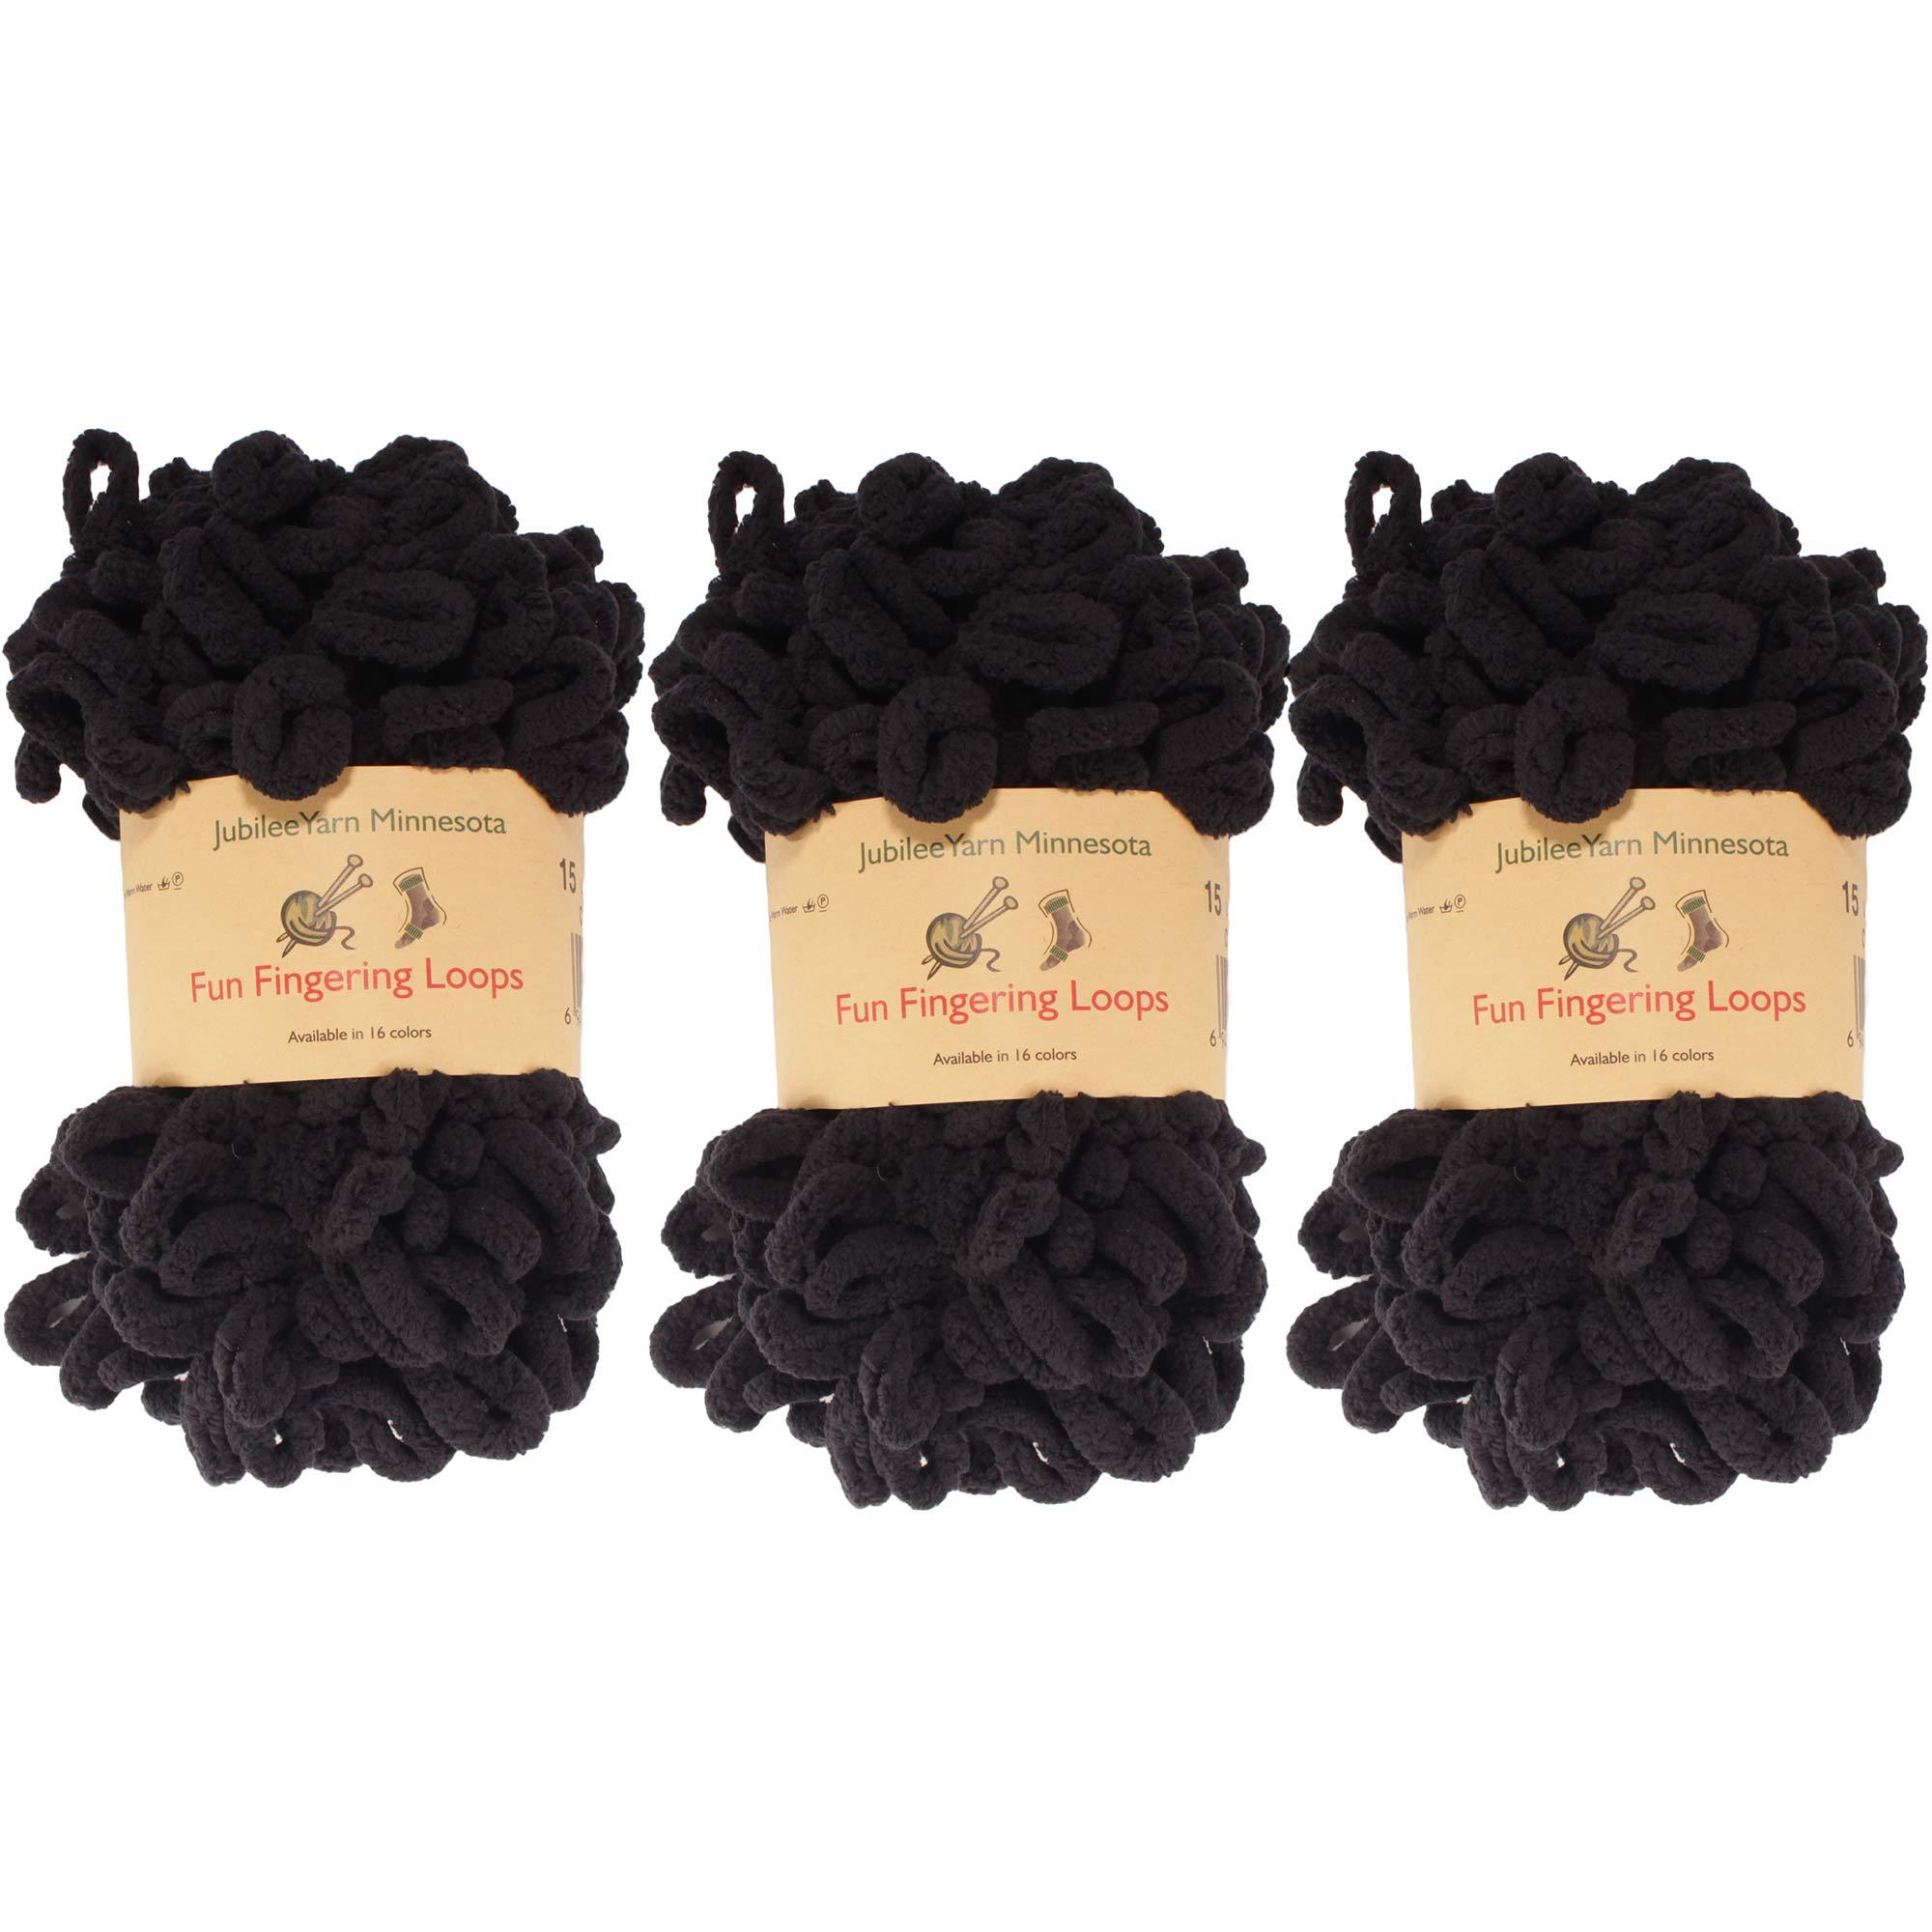 BambooMN Finger Knitting Yarn - Fun Finger Loops Yarn - 100% Polyester - Black - 3 Skeins